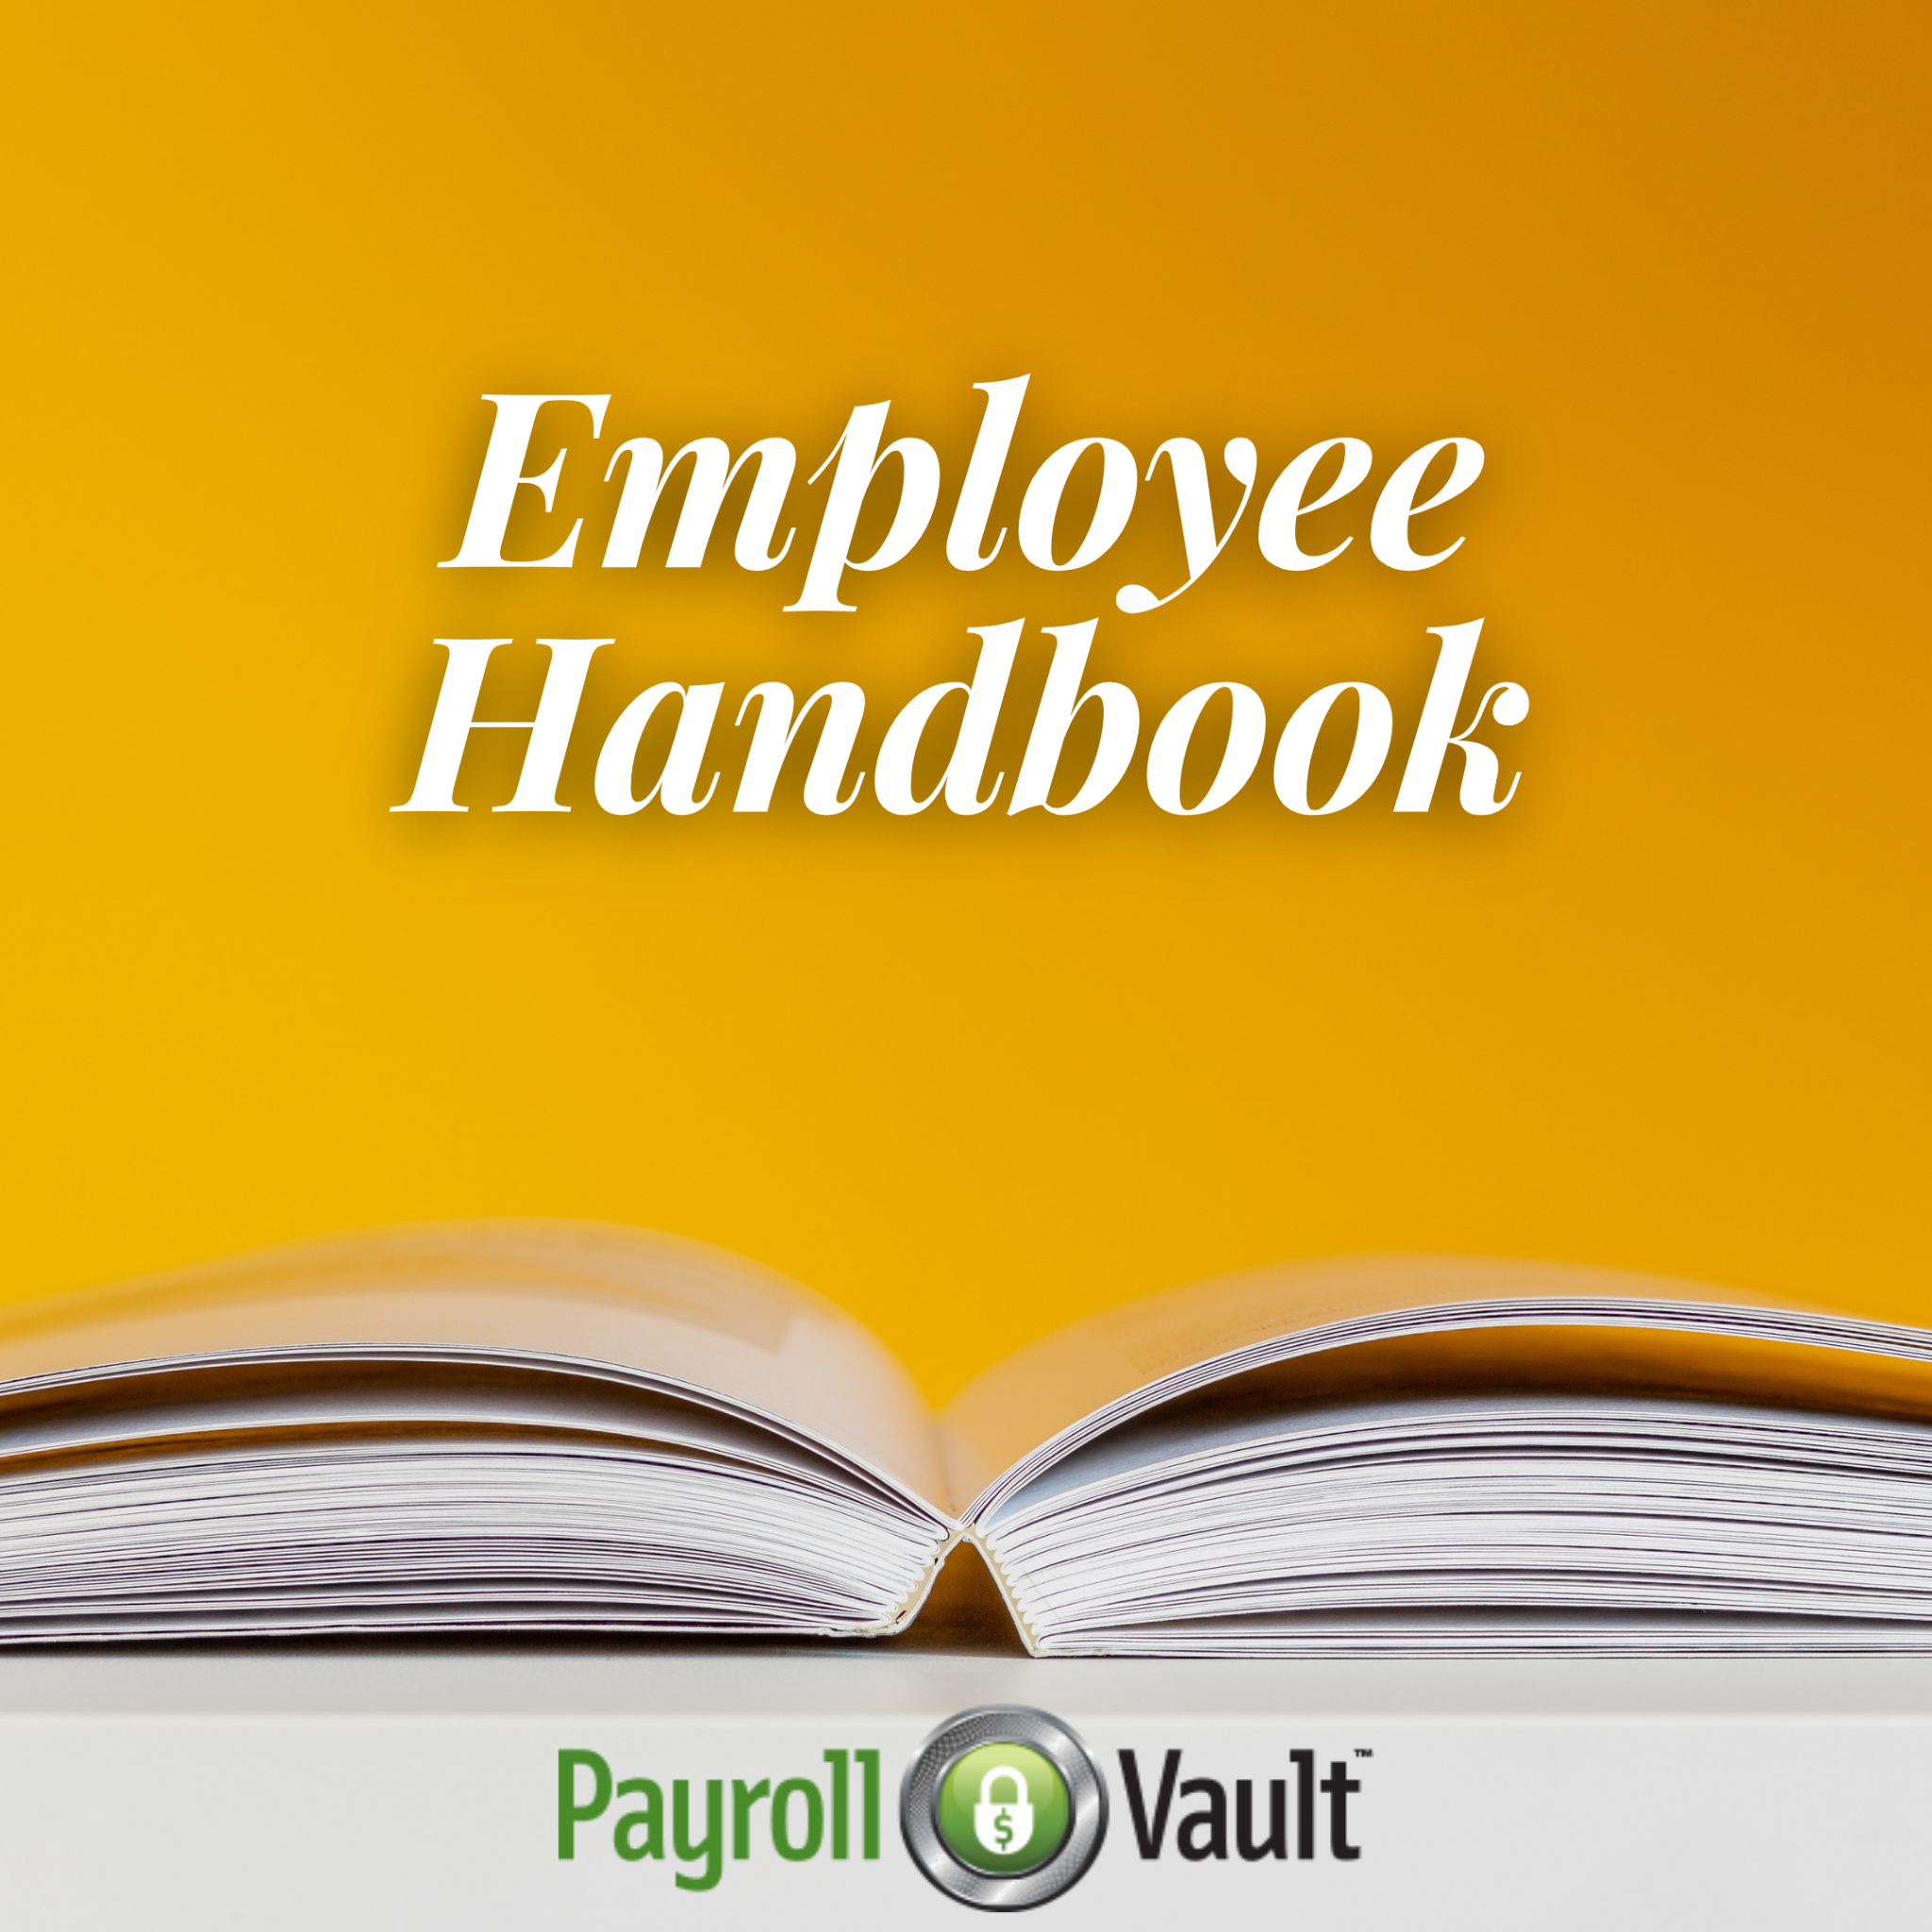 handbook-1-